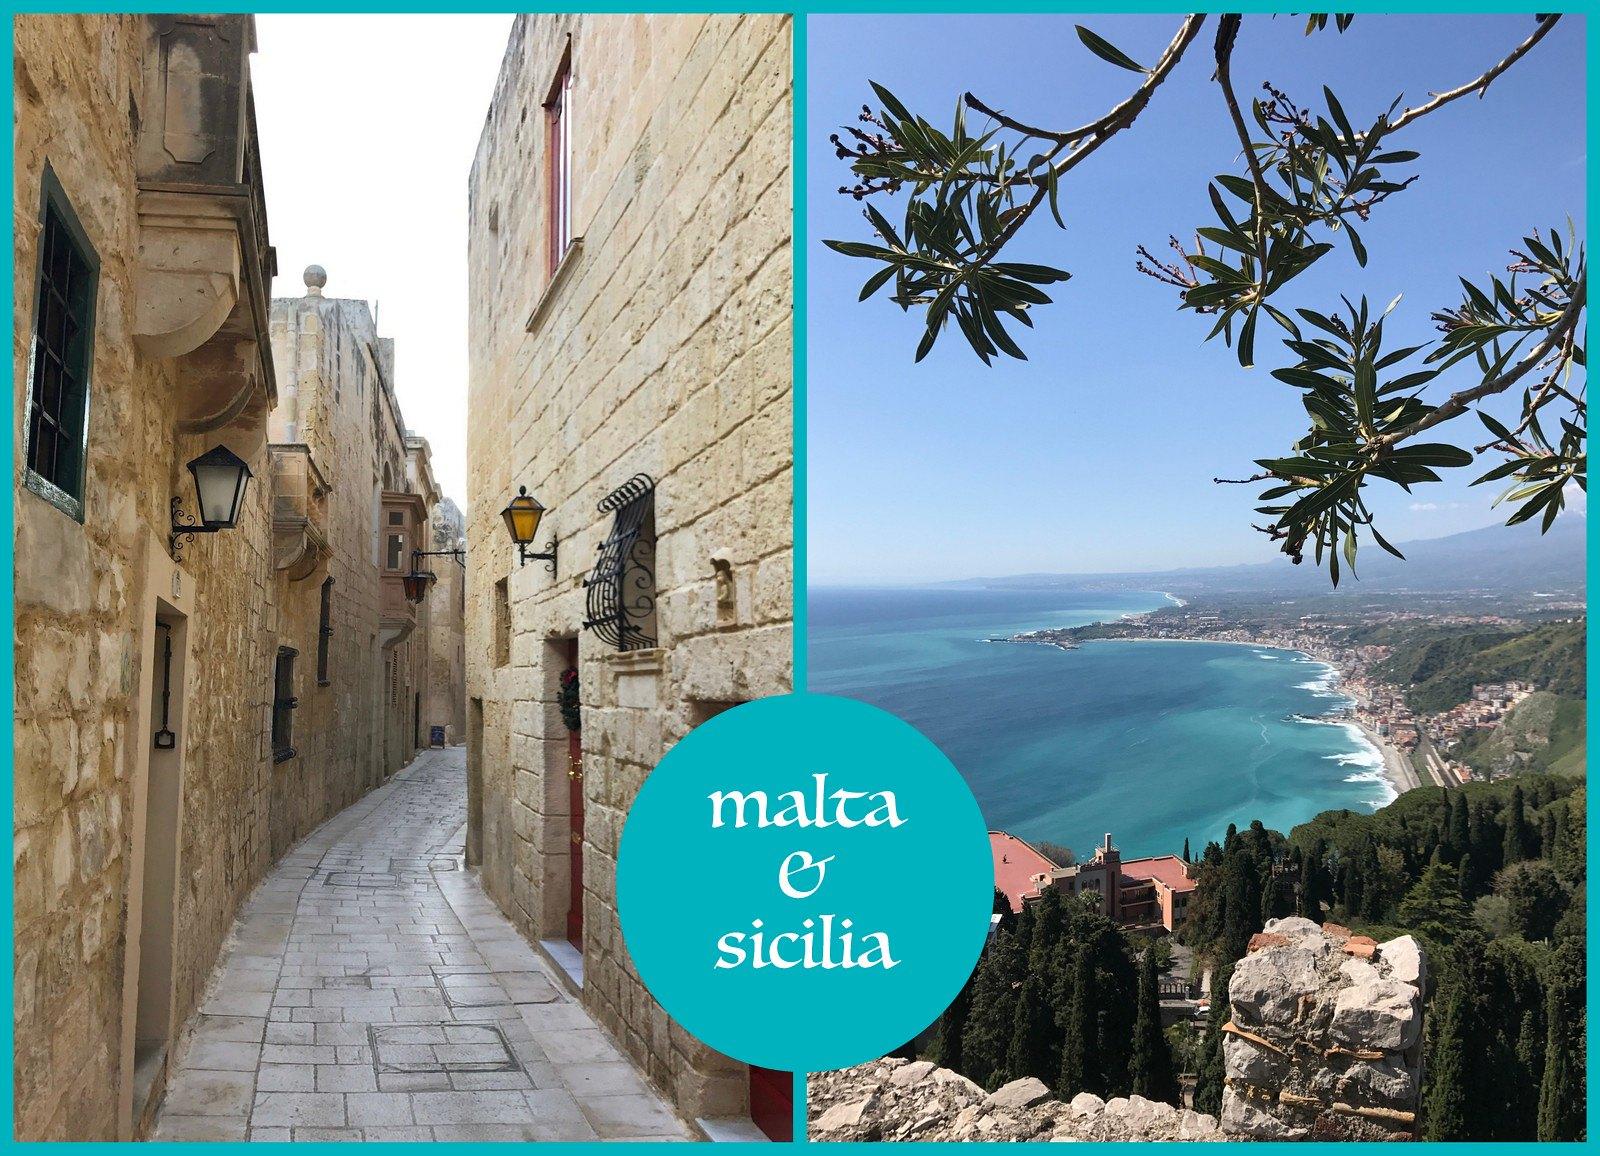 malta/sicilië